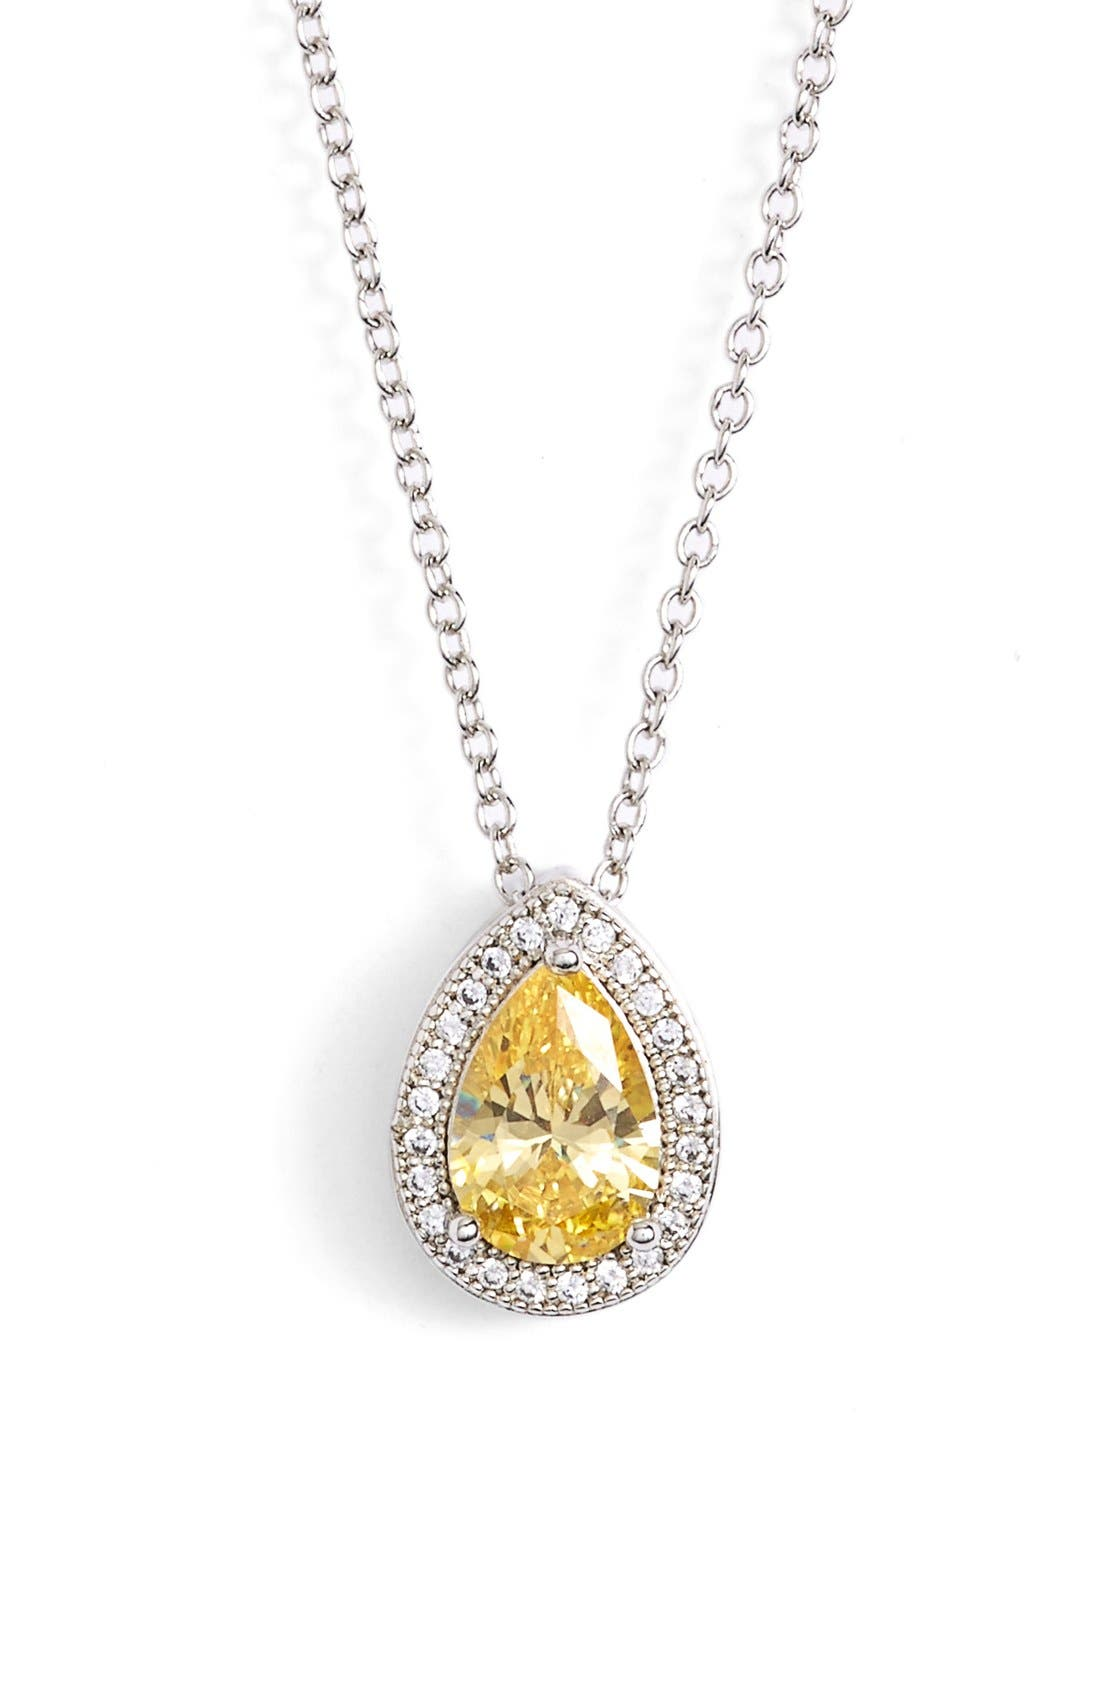 Main Image - Lafonn'Lassaire' CanaryStone Pendant Necklace